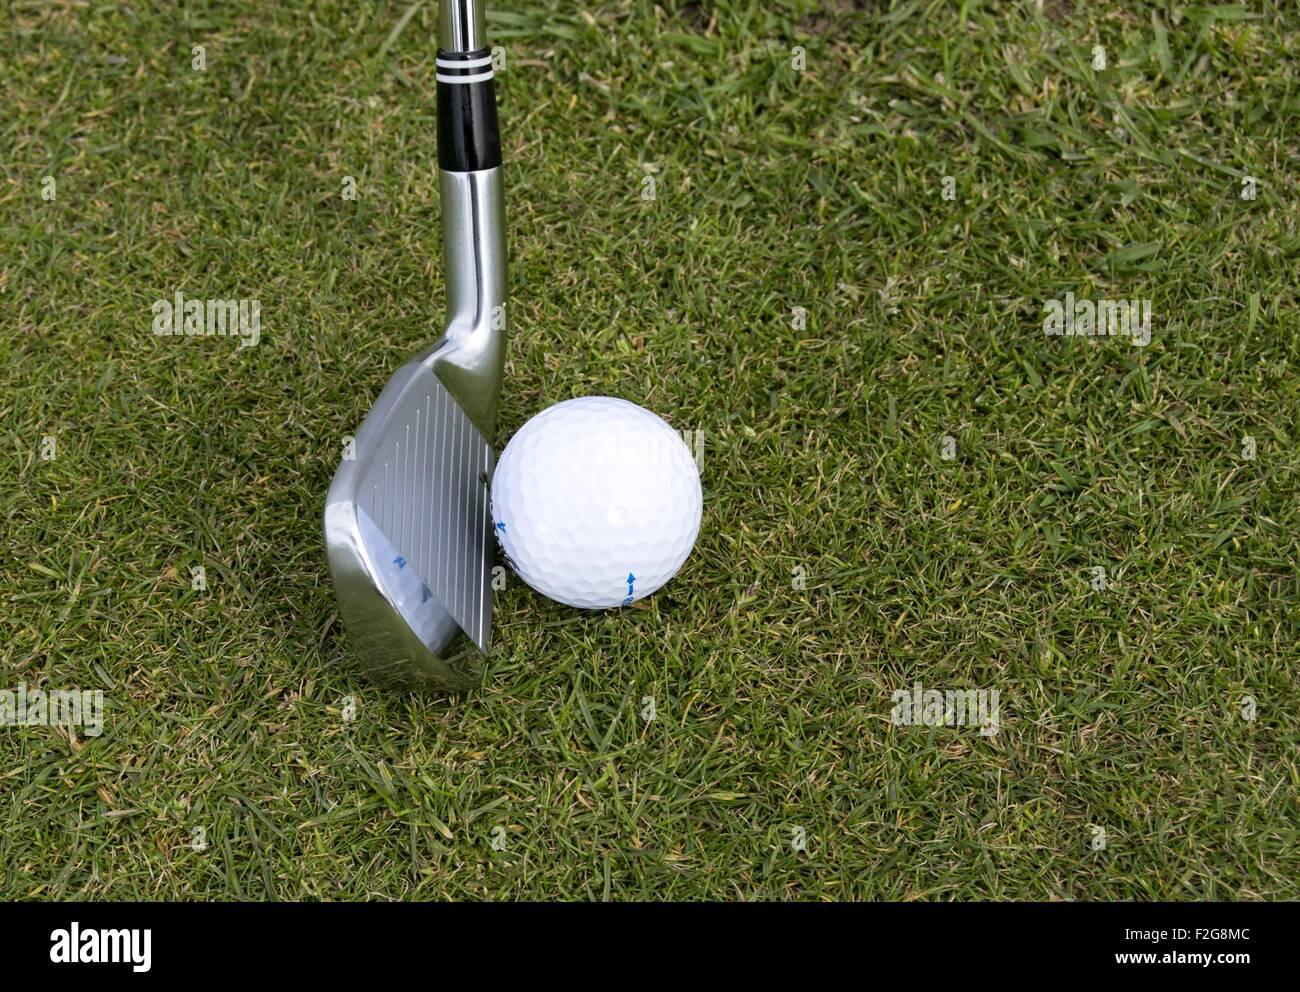 Golf - Stock Image